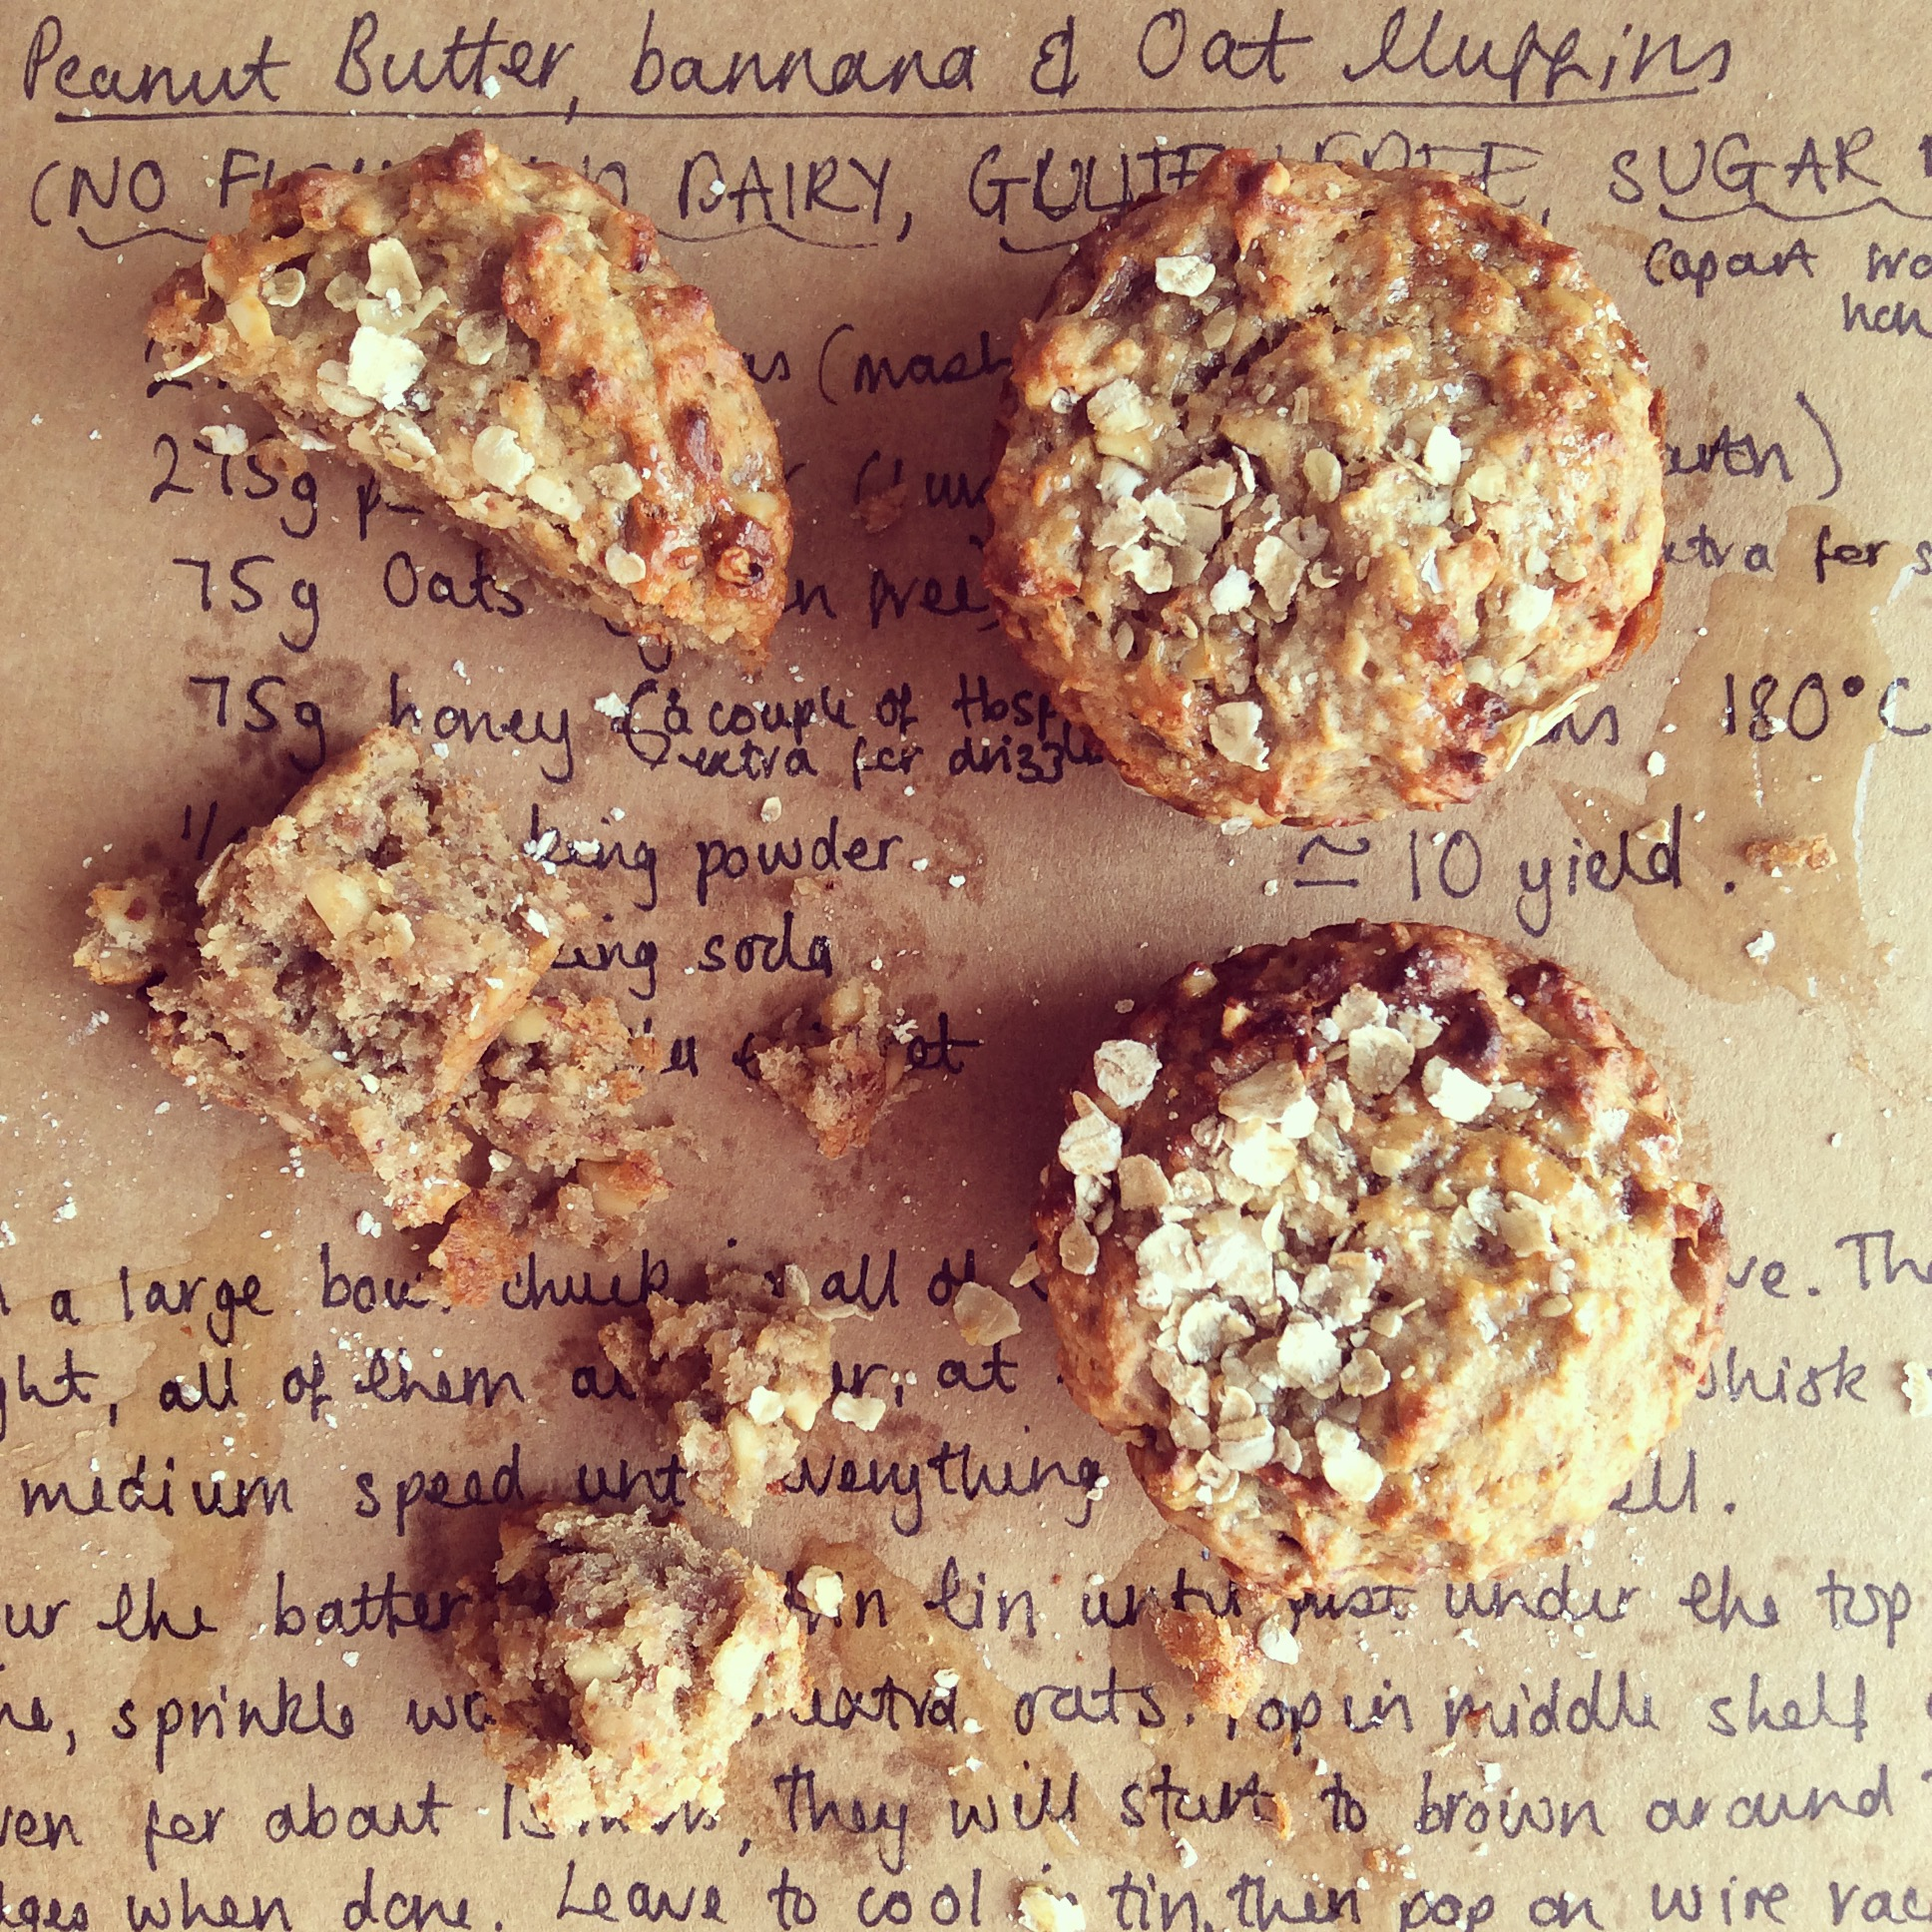 """Healthy Alternative"" Peanut Butter, Banana & Oat Muffins"